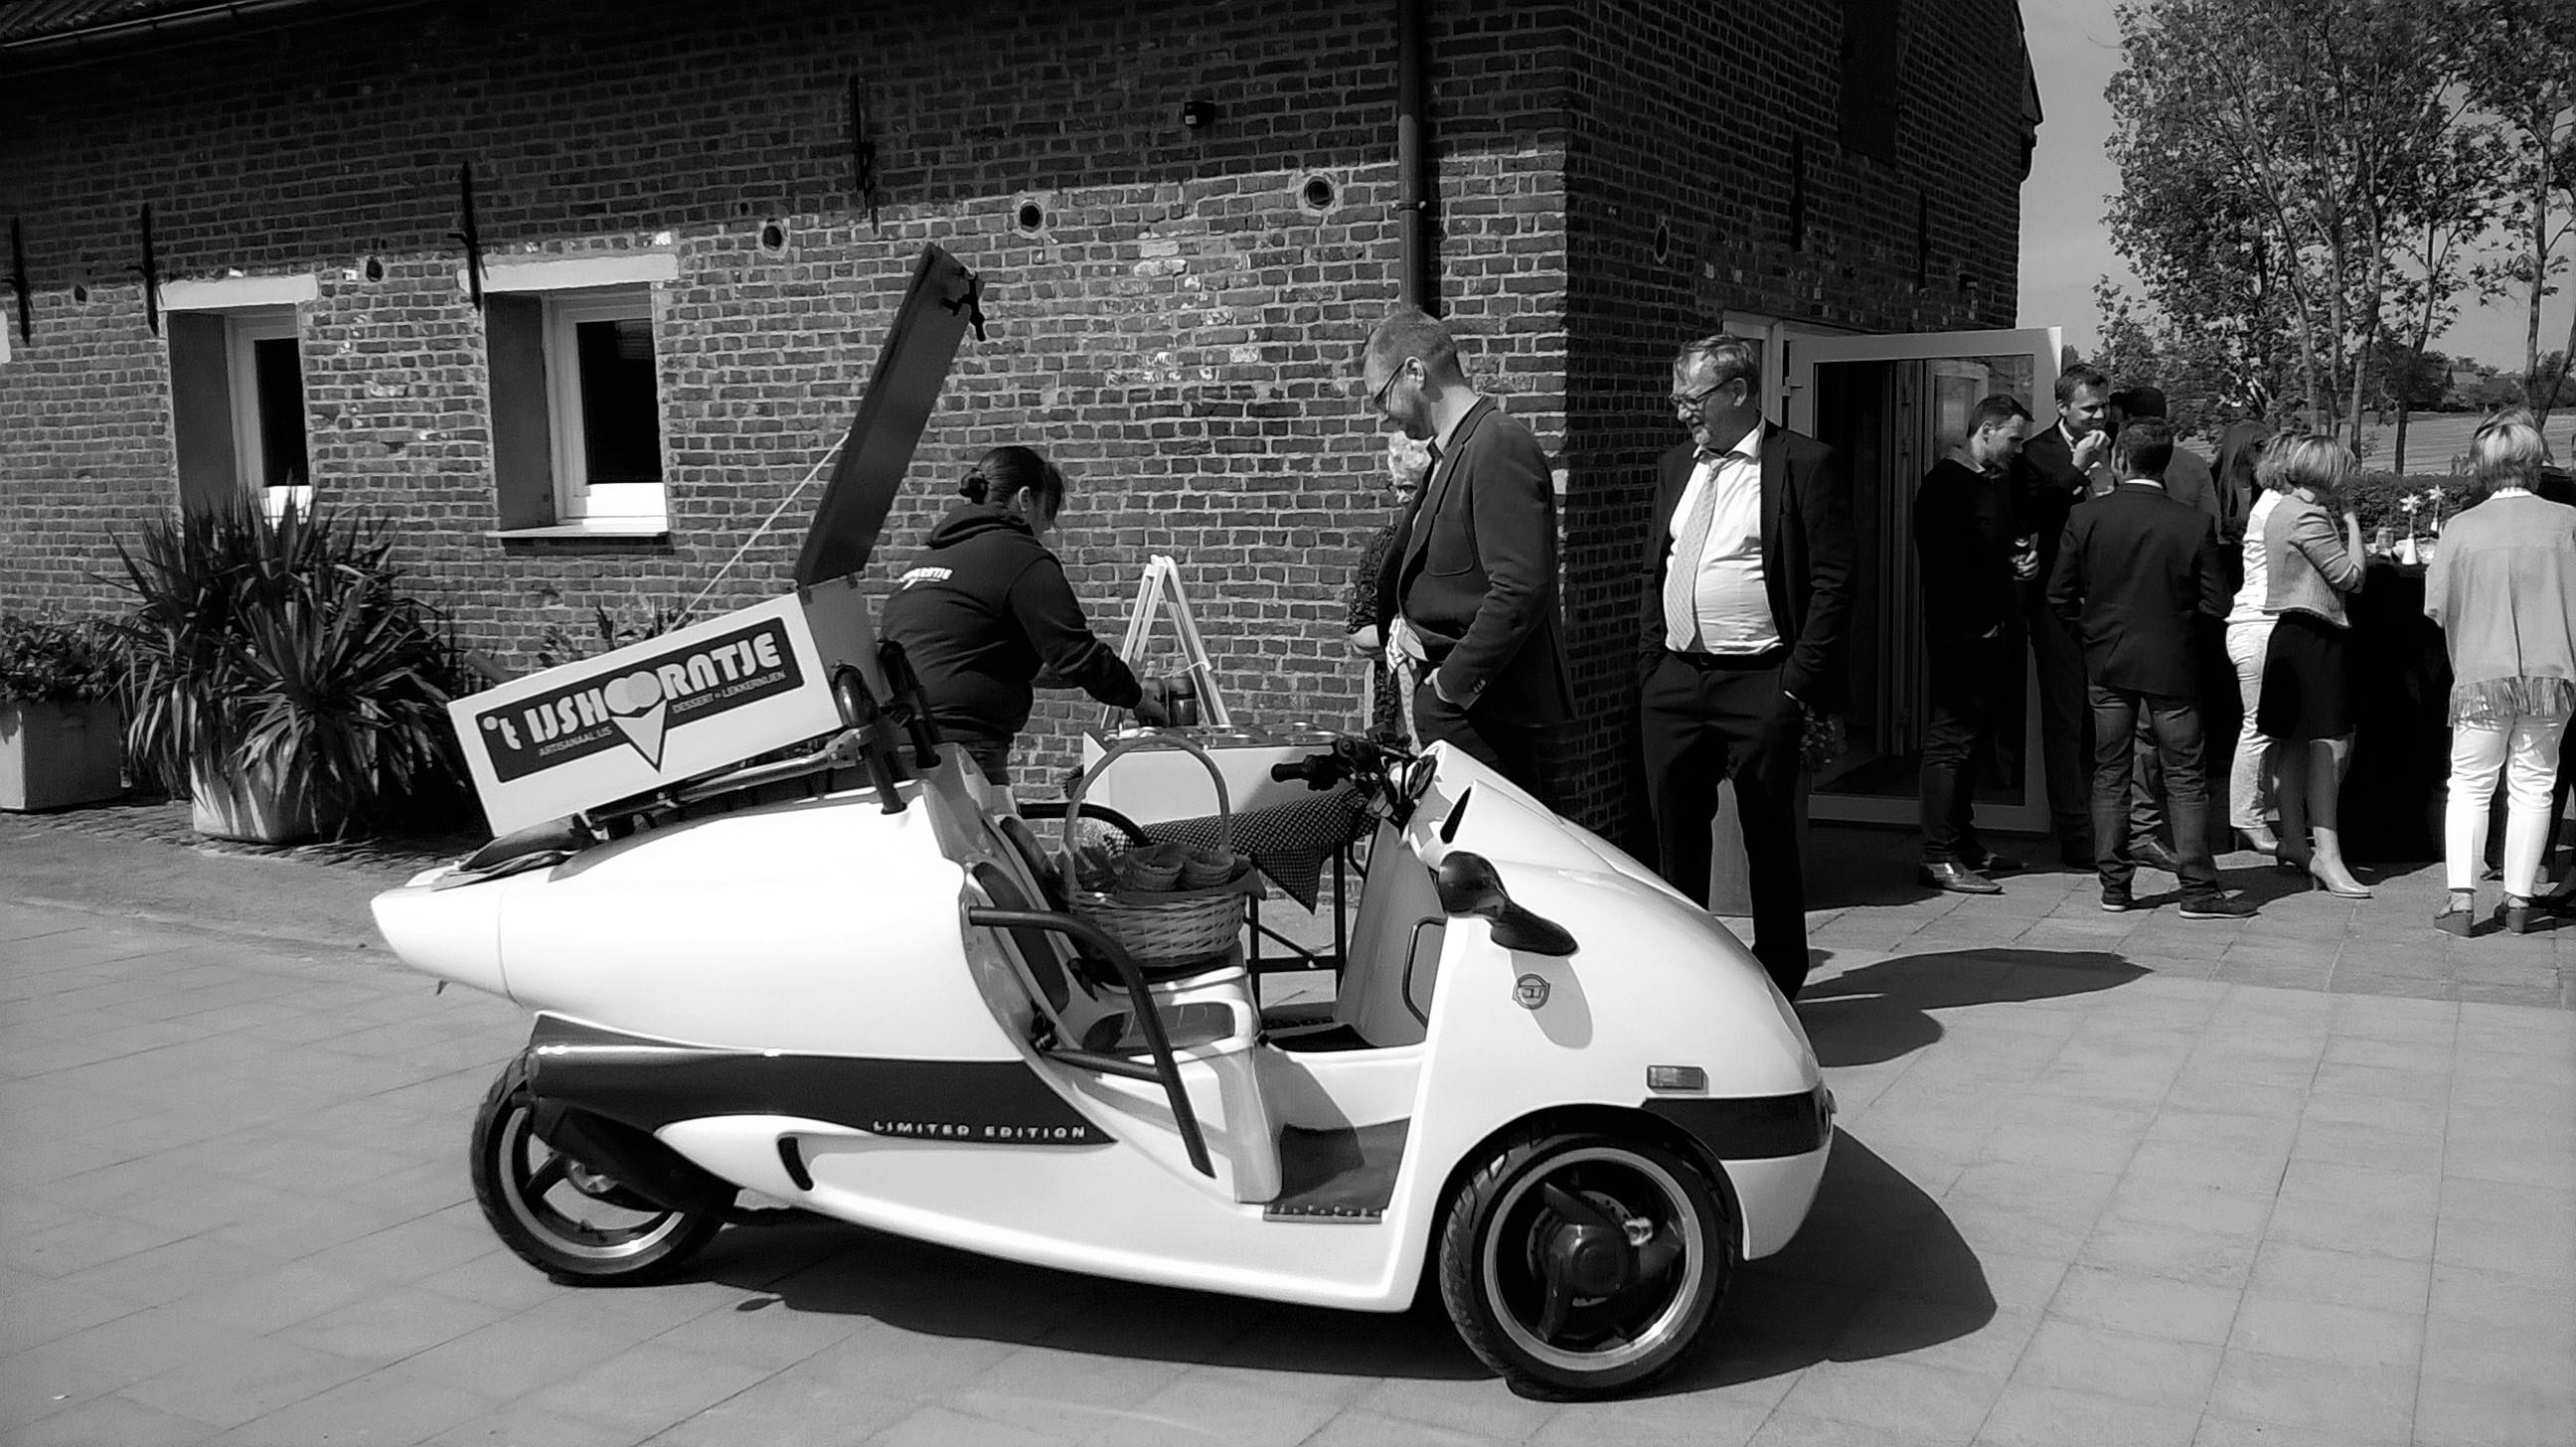 De ijsscooter by Tijshoorntje Tielt